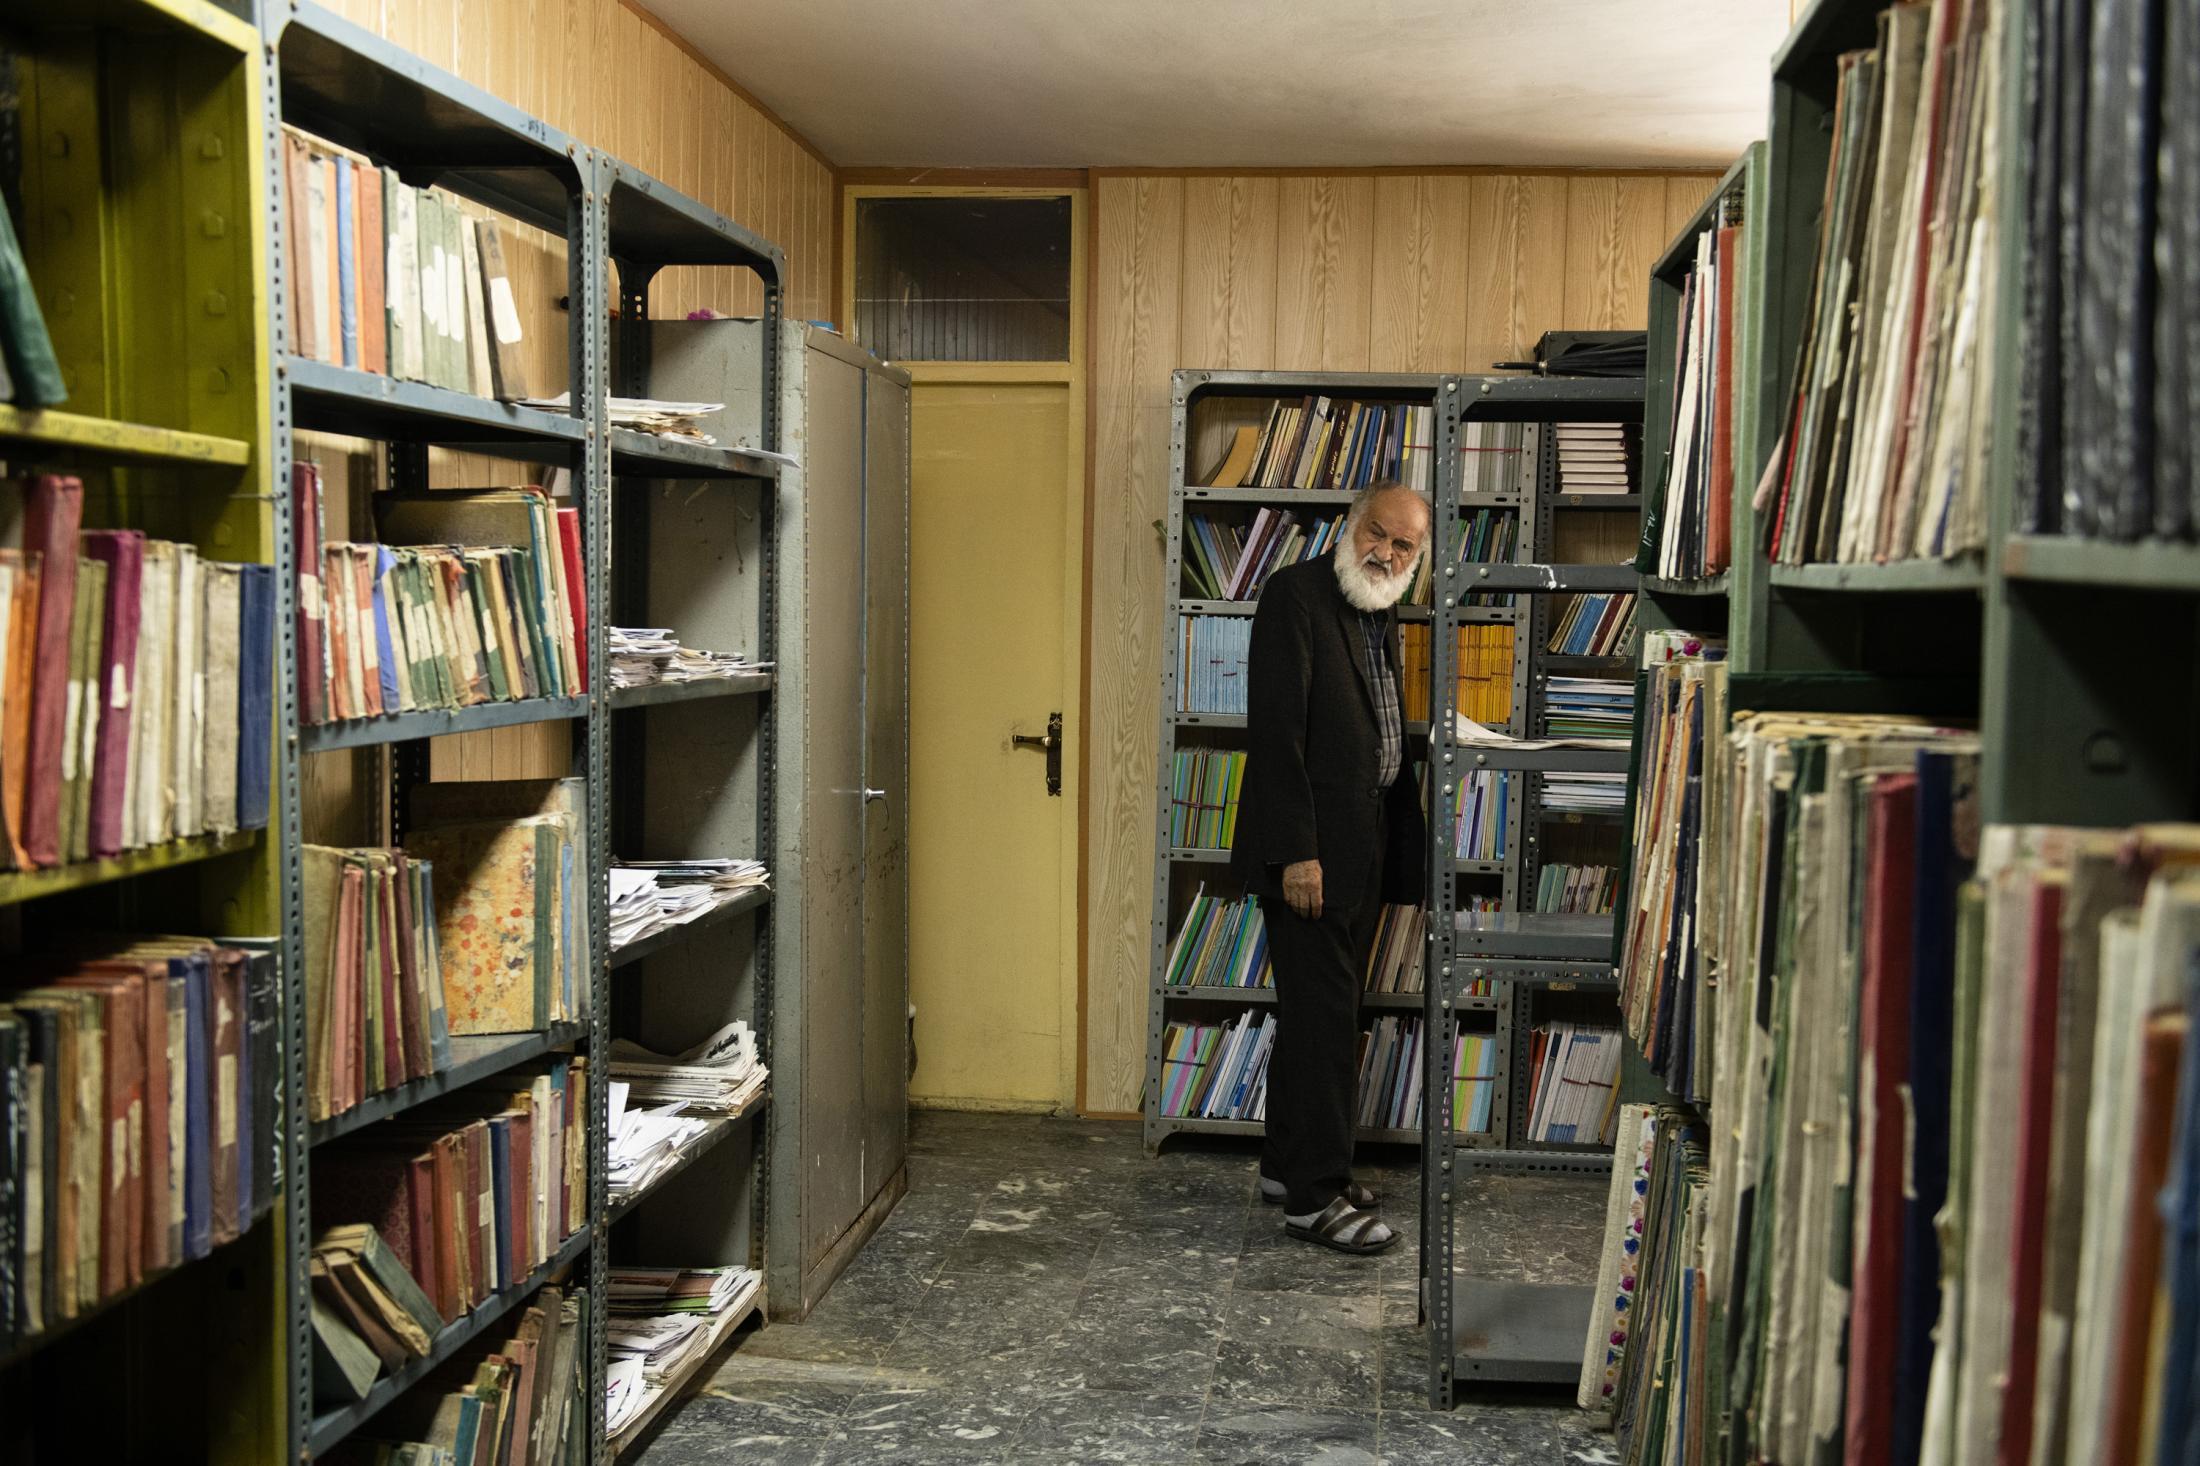 KABUL | | 10/16/19 | Haidari Wojoodi (80) walks back to his desk after he walked out one of his visitors.